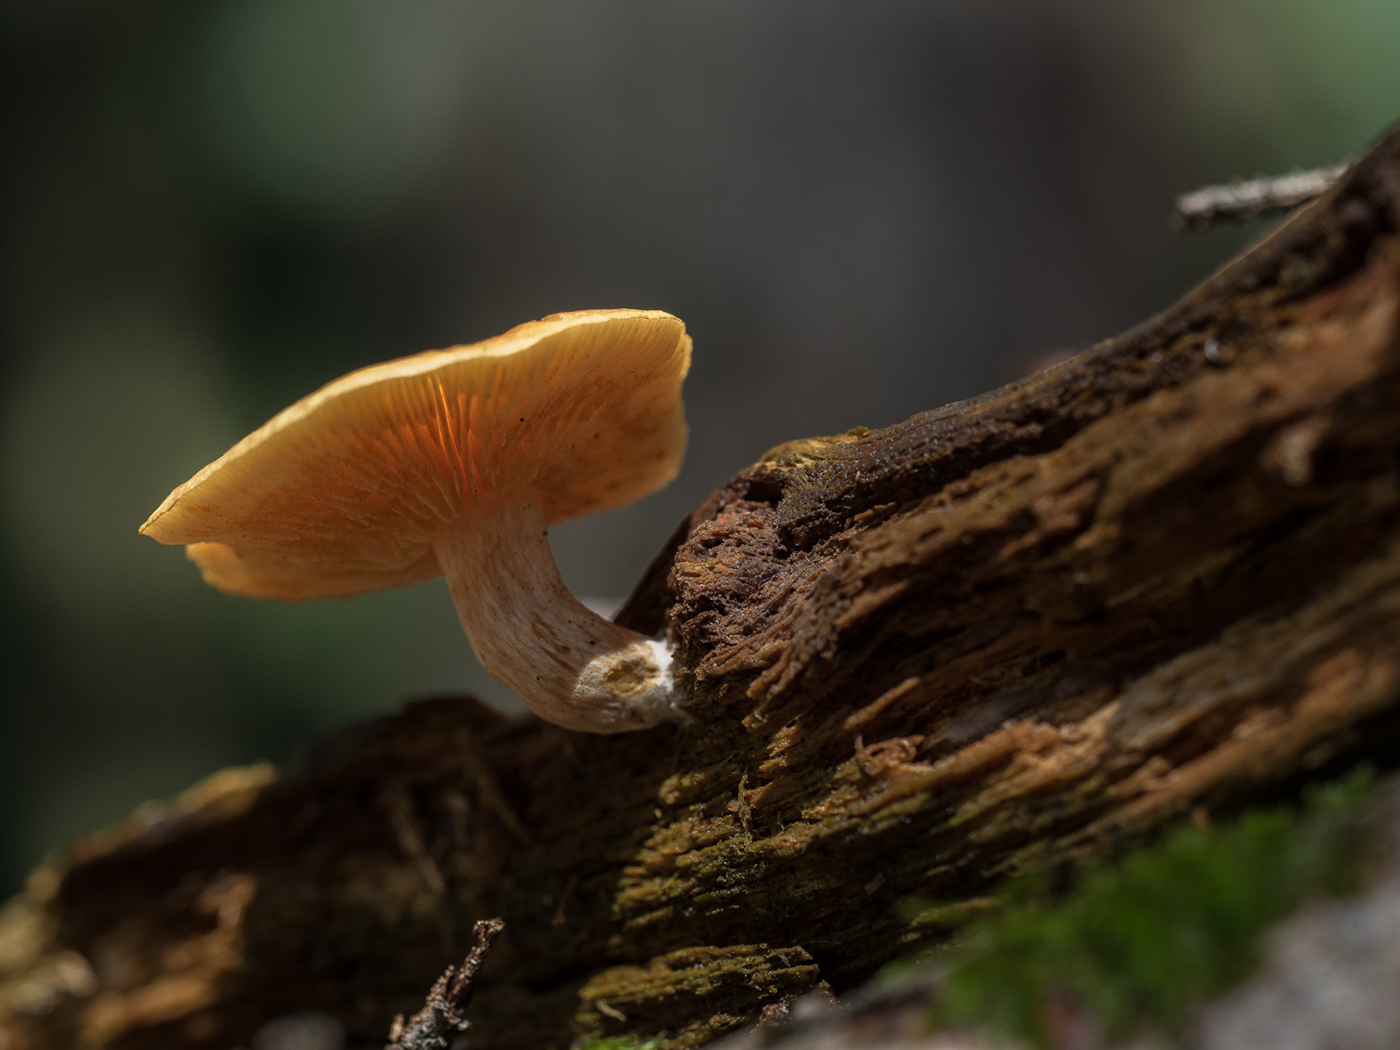 Лесные грибы / фотограф Lothar Malm